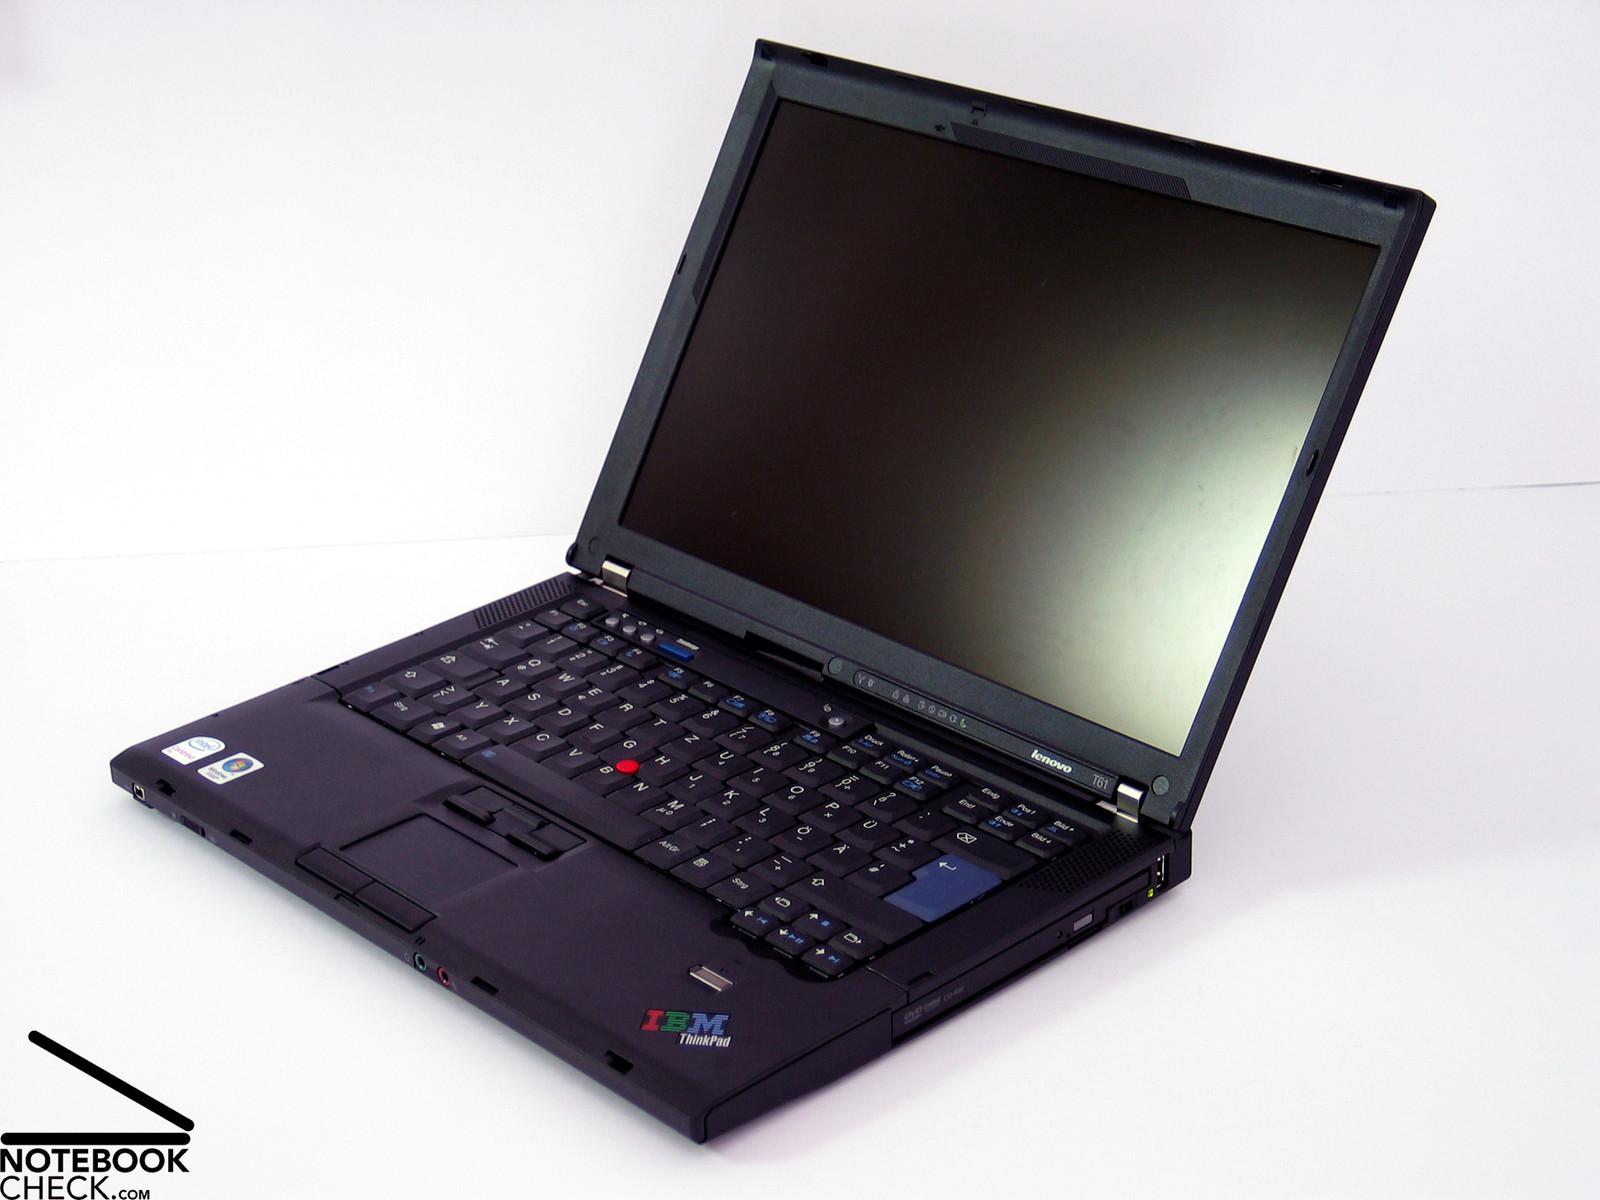 IBM/Lenovo Thinkpad T61 Notebook: Recensione - Notebookcheck.it